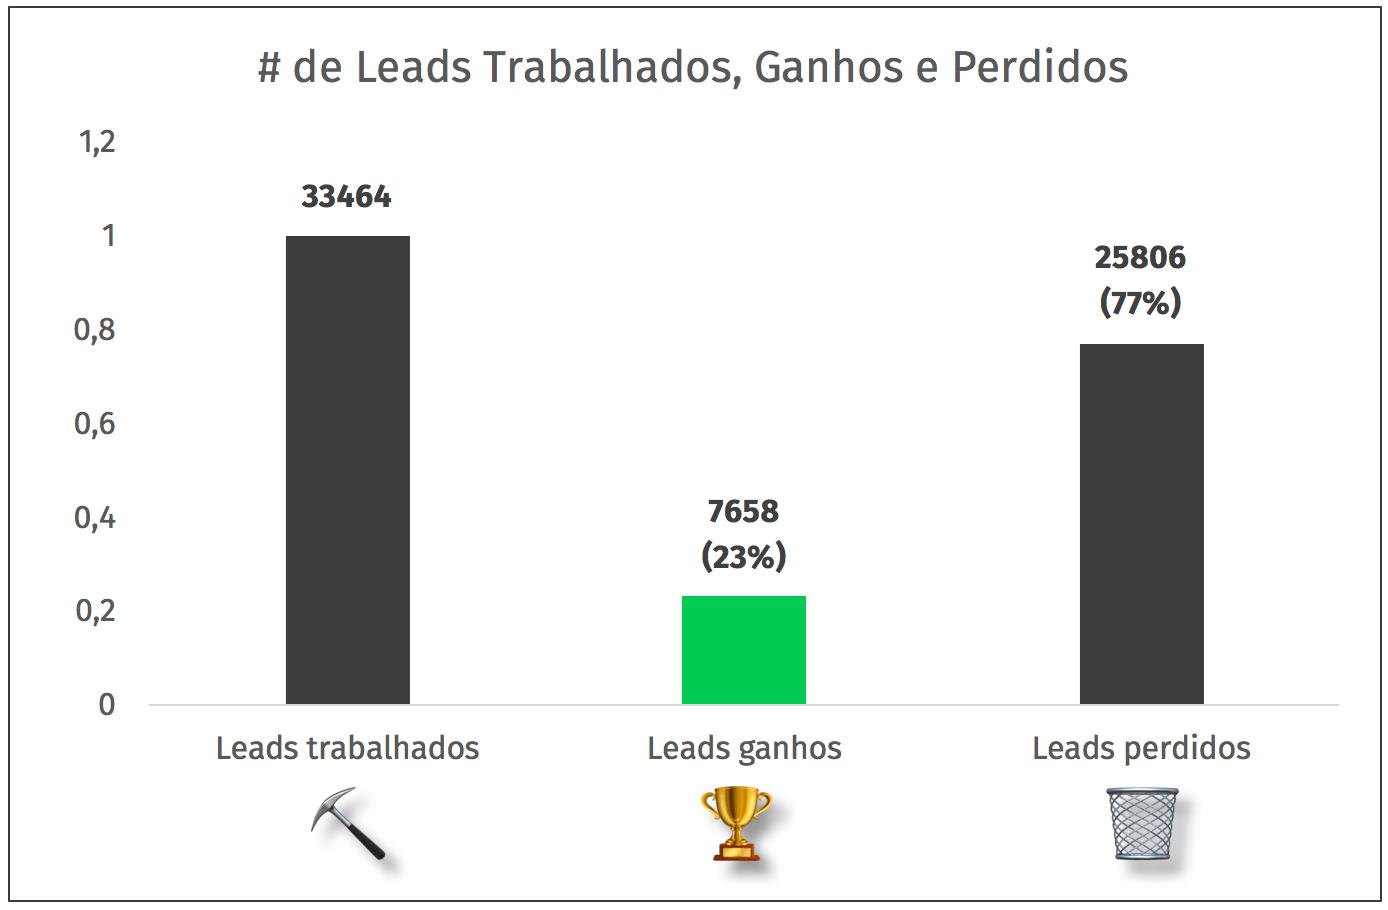 leads trabalhados